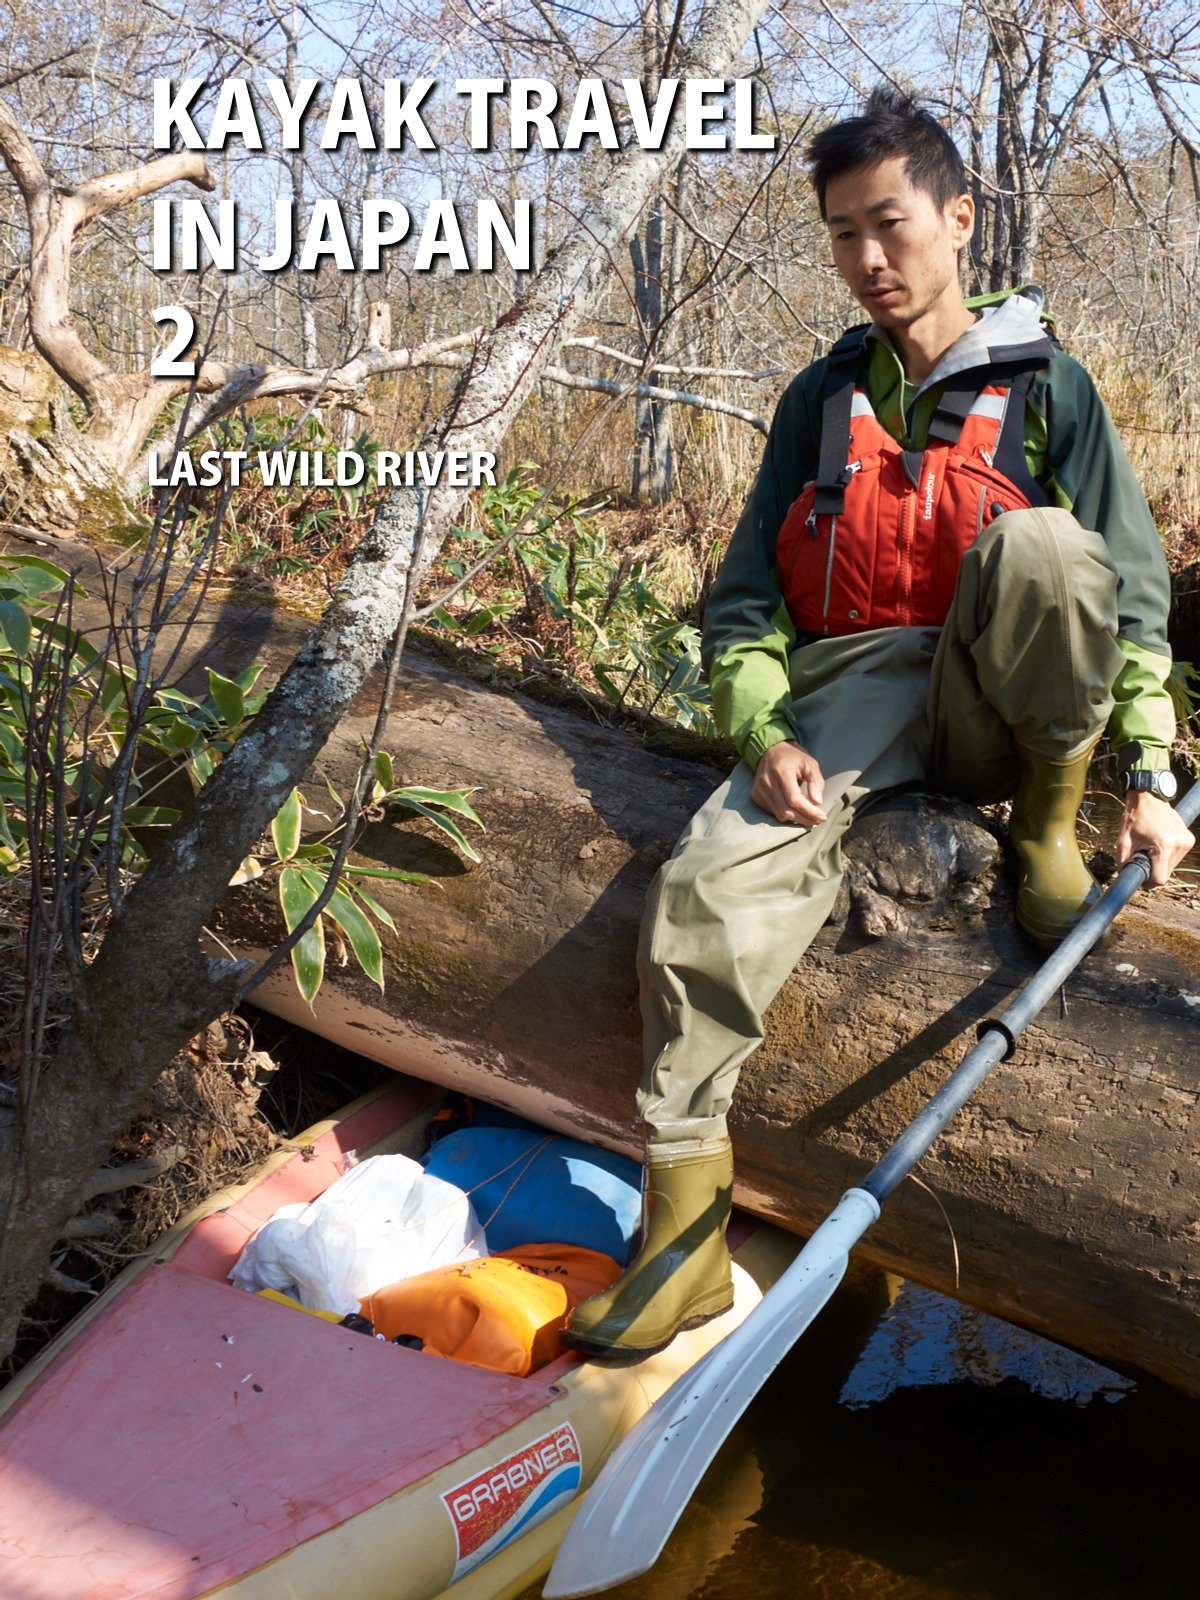 Kayak Travel in Japan 2 on Amazon Prime Video UK